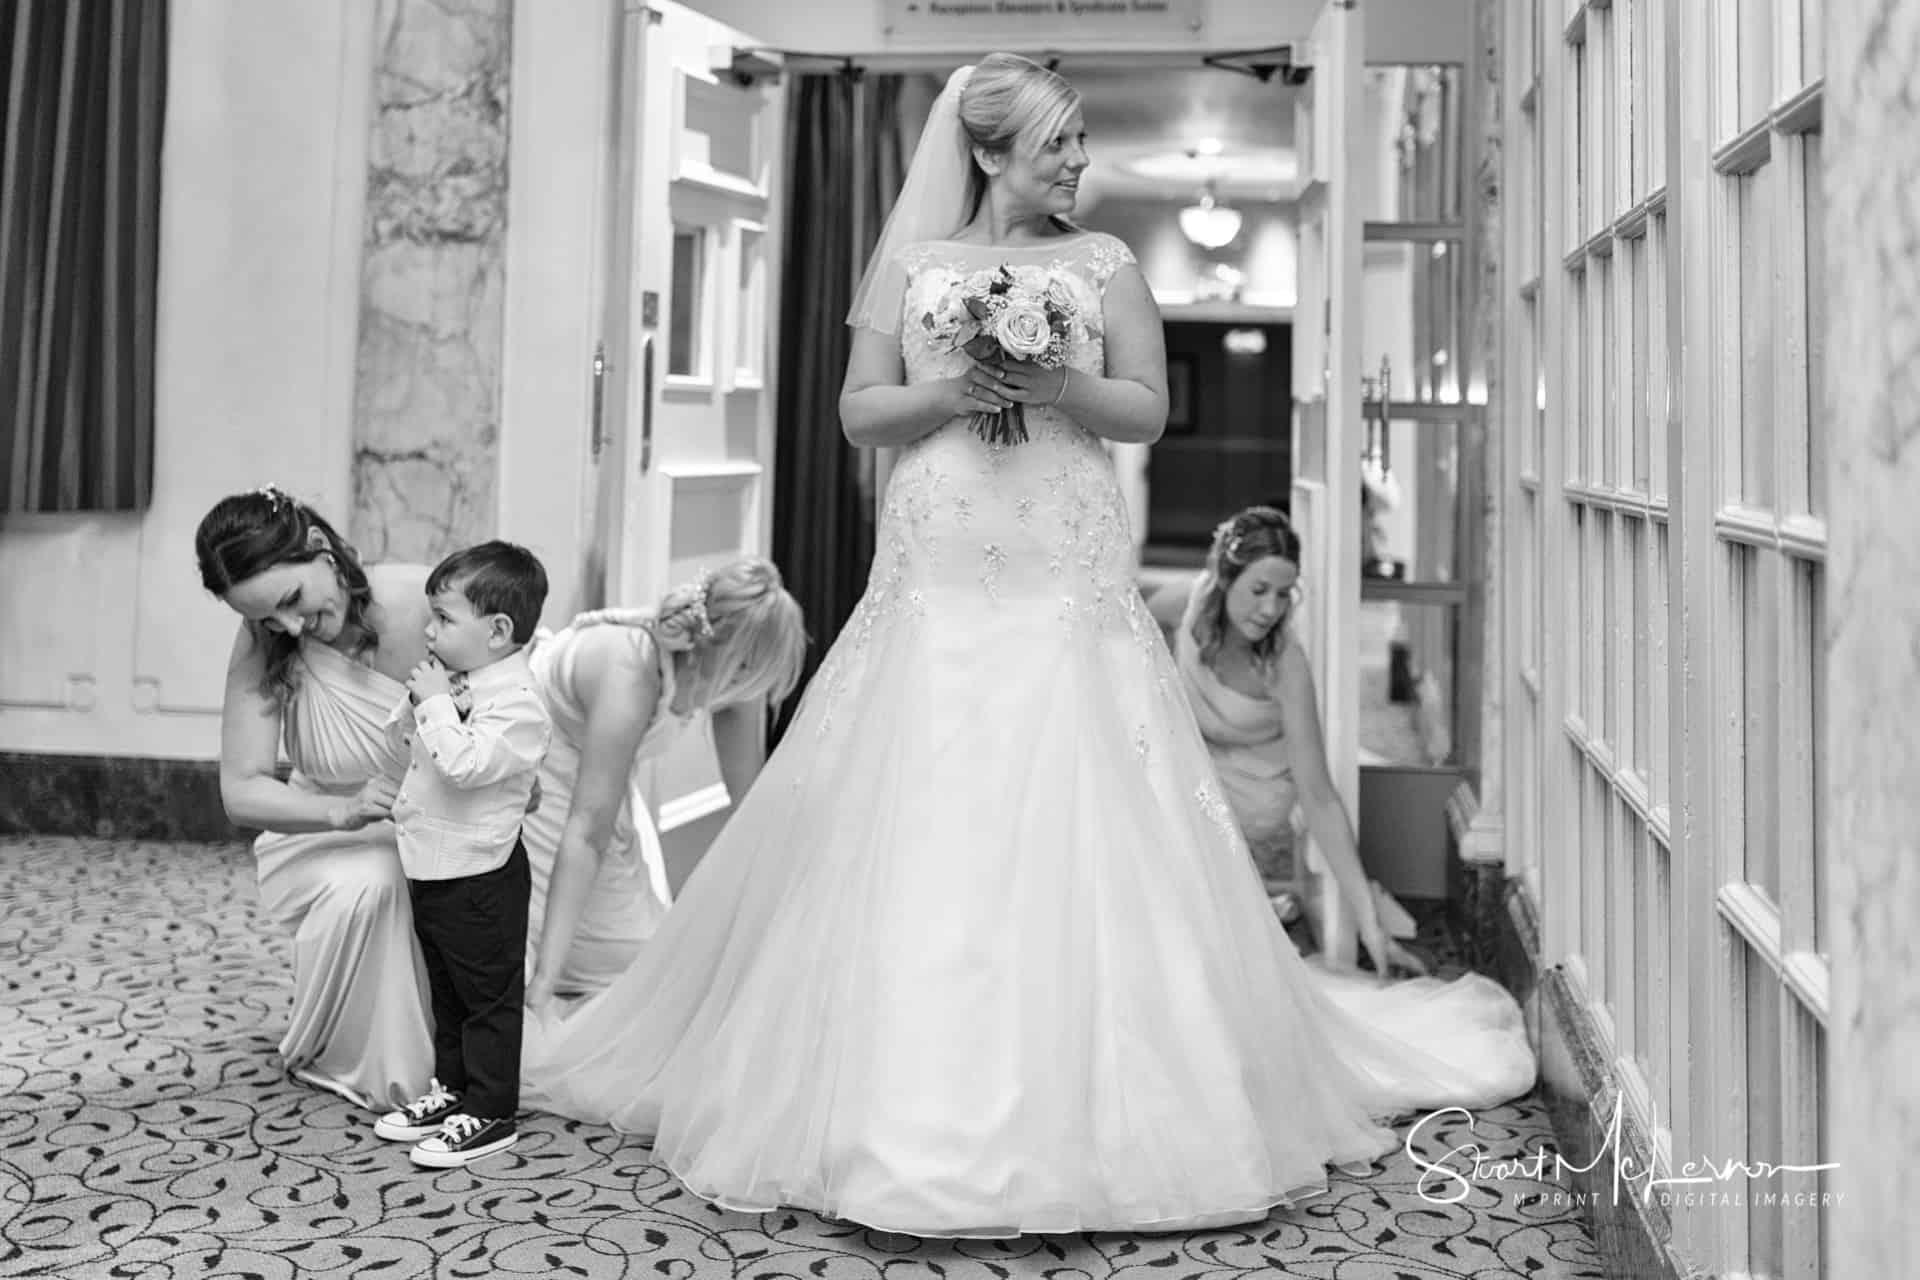 Midland Hotel Manchester Wedding Photography by Stuart McLernon | M-PRINT Digital Imagery